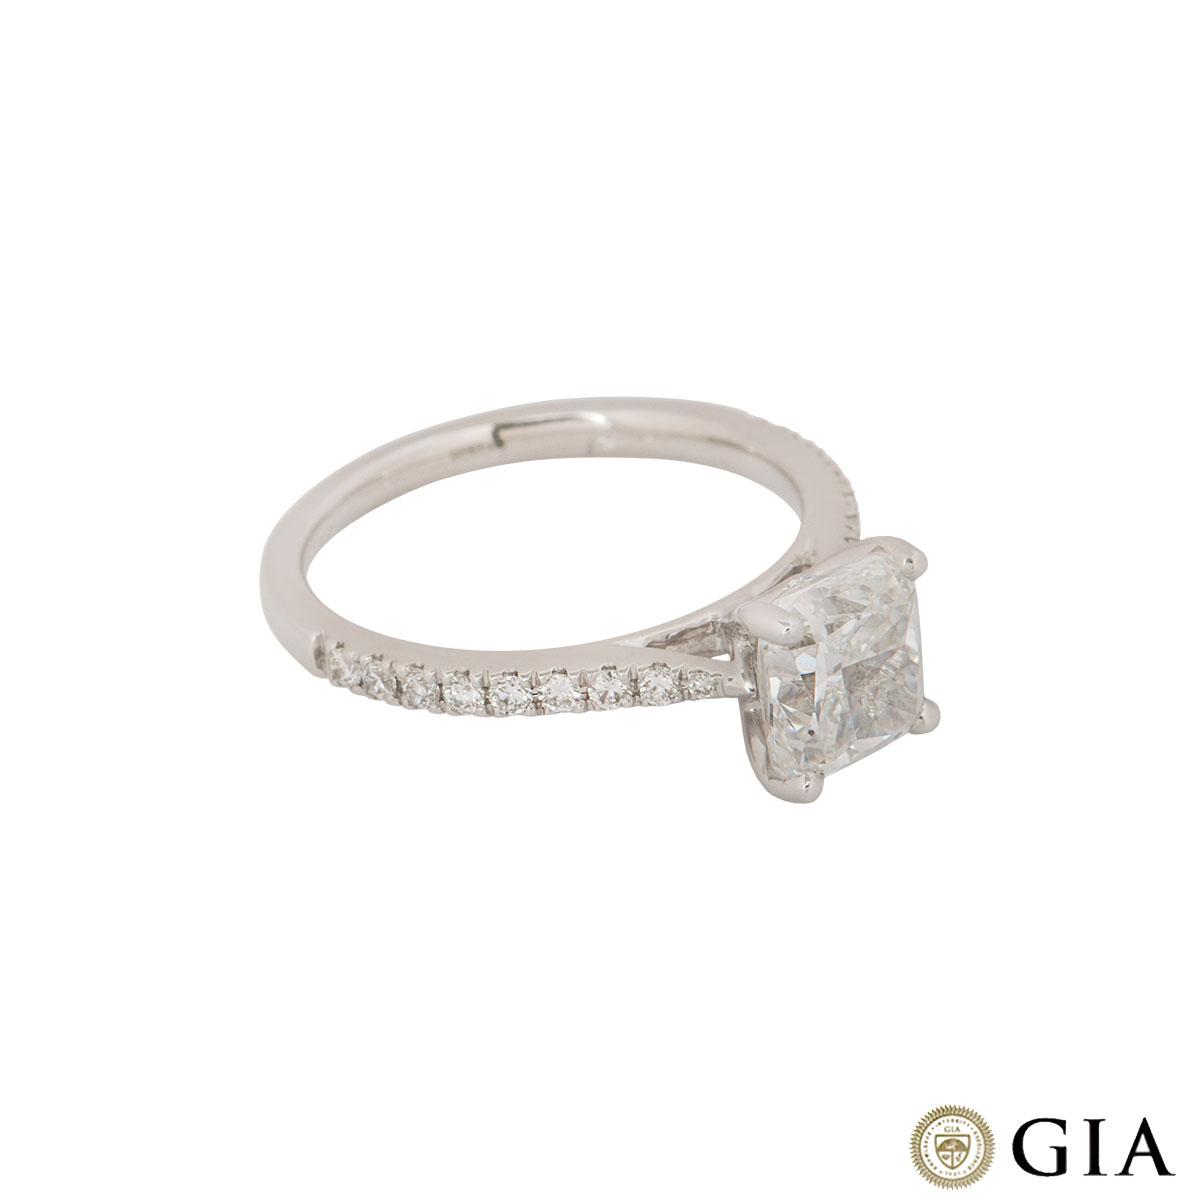 White Gold Cushion Cut Diamond Ring 1.81ct F/VS2